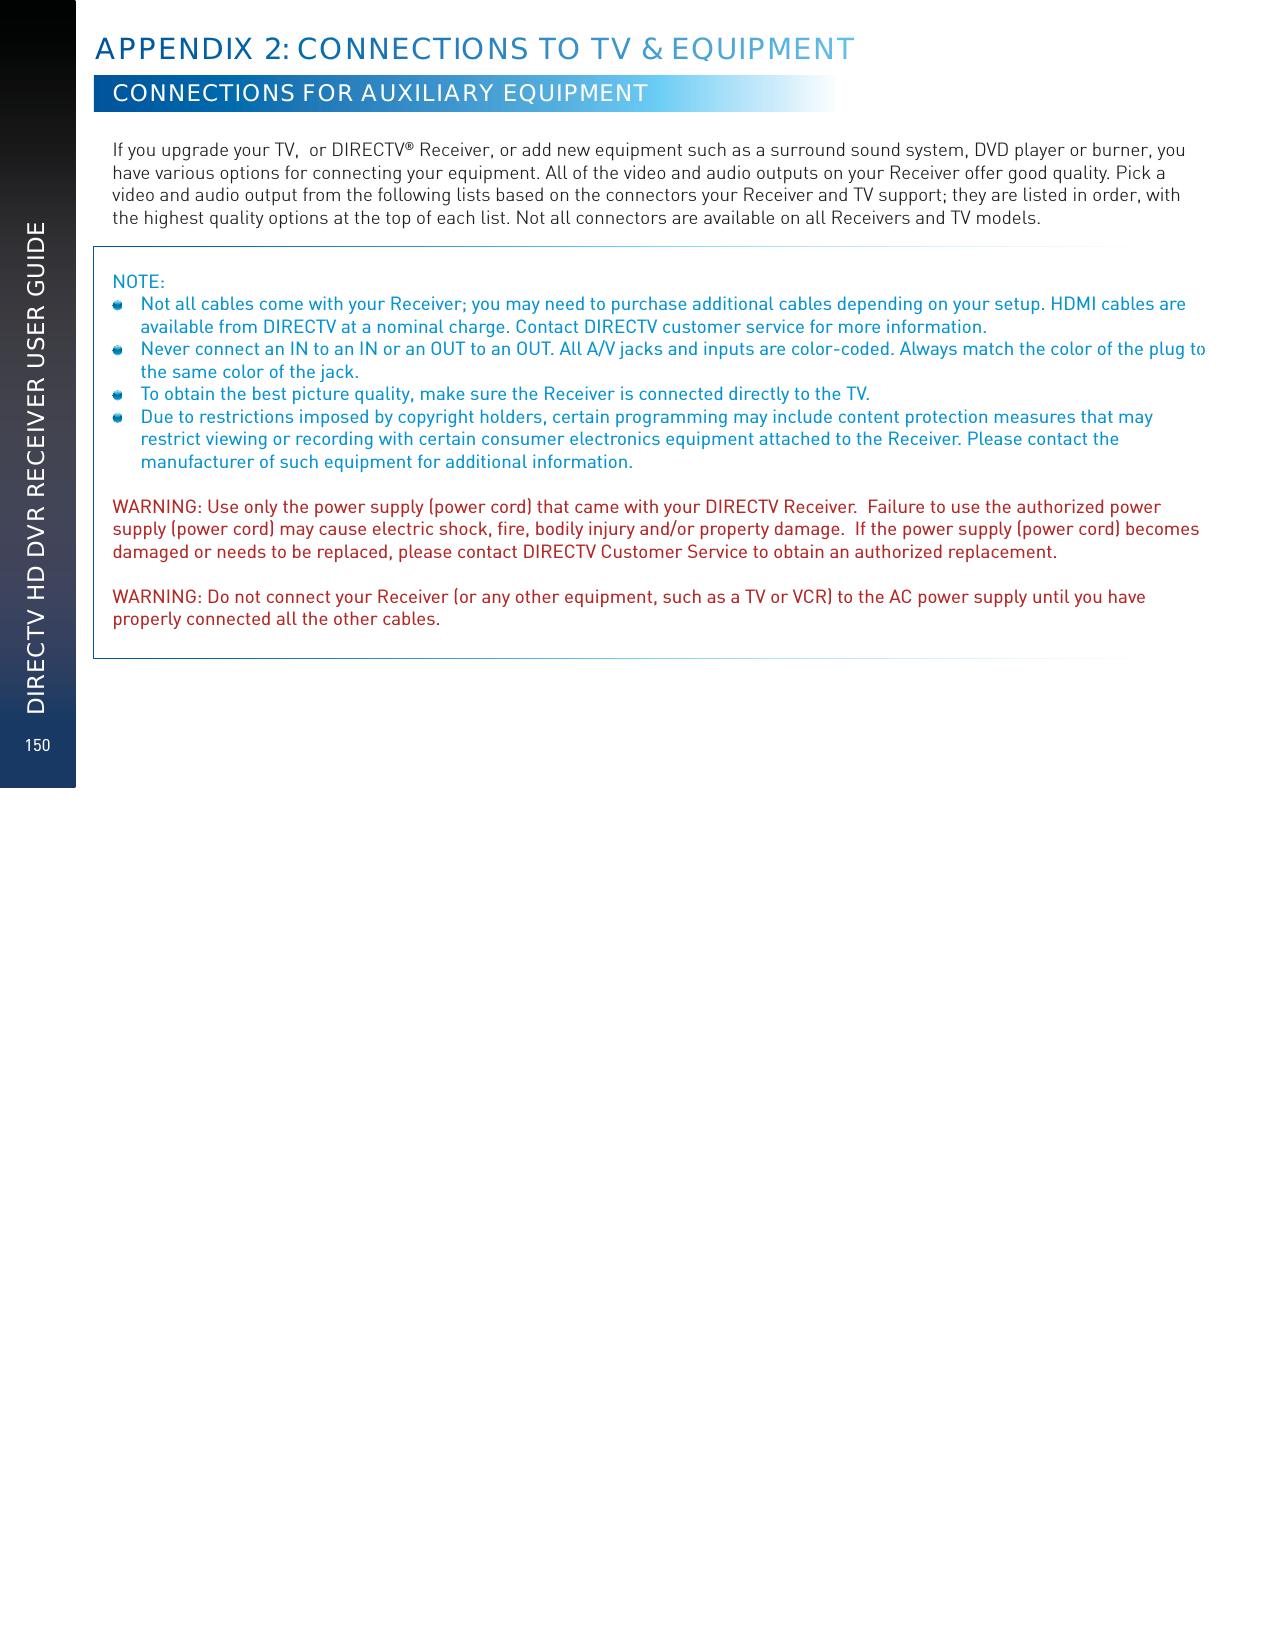 ARRIS C61 Set Top Box MoCA client with integrated RF4CE